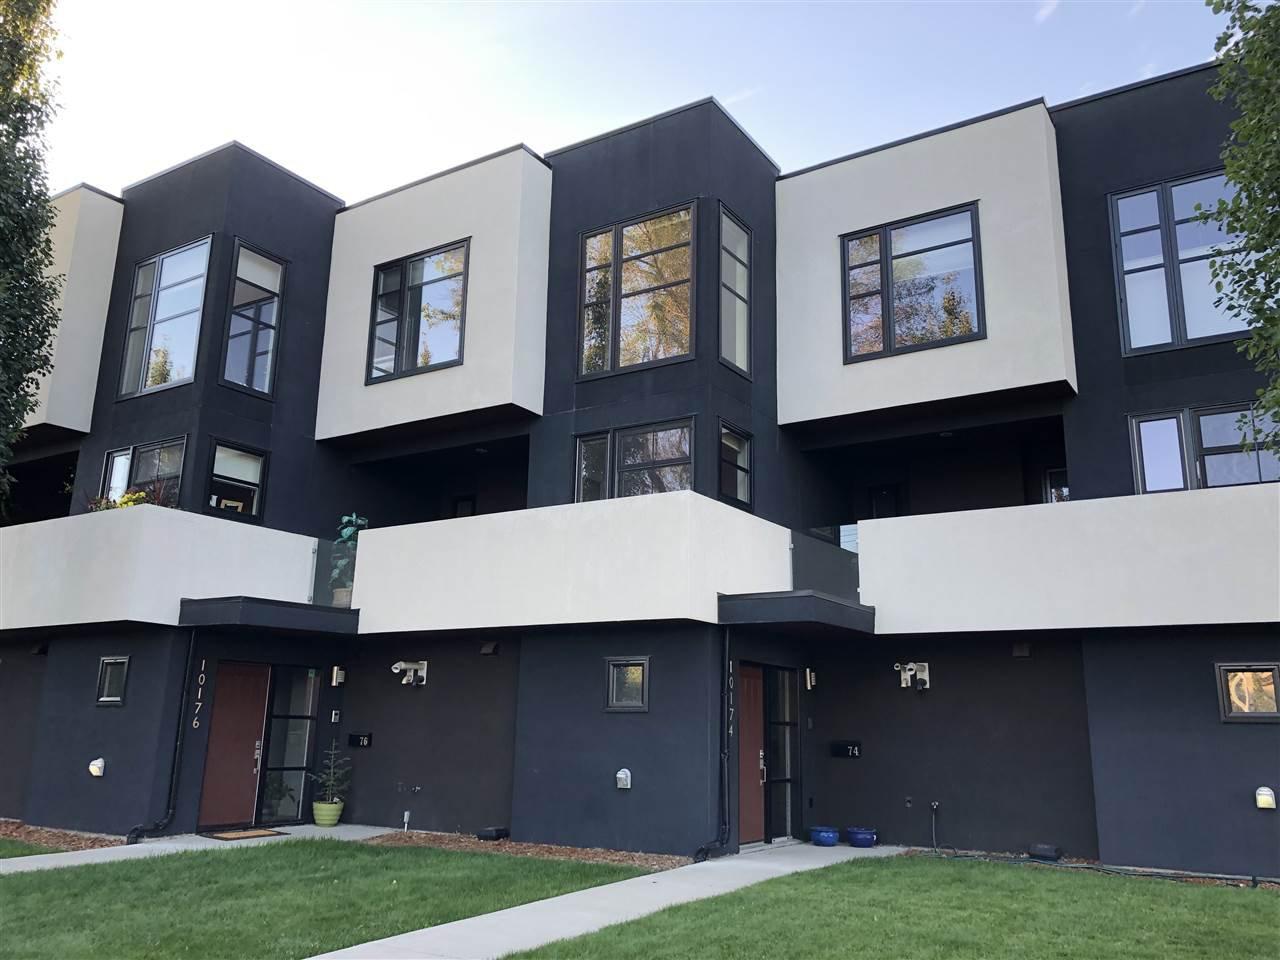 Main Photo: 10174 143 Street in Edmonton: Zone 21 Townhouse for sale : MLS®# E4208068